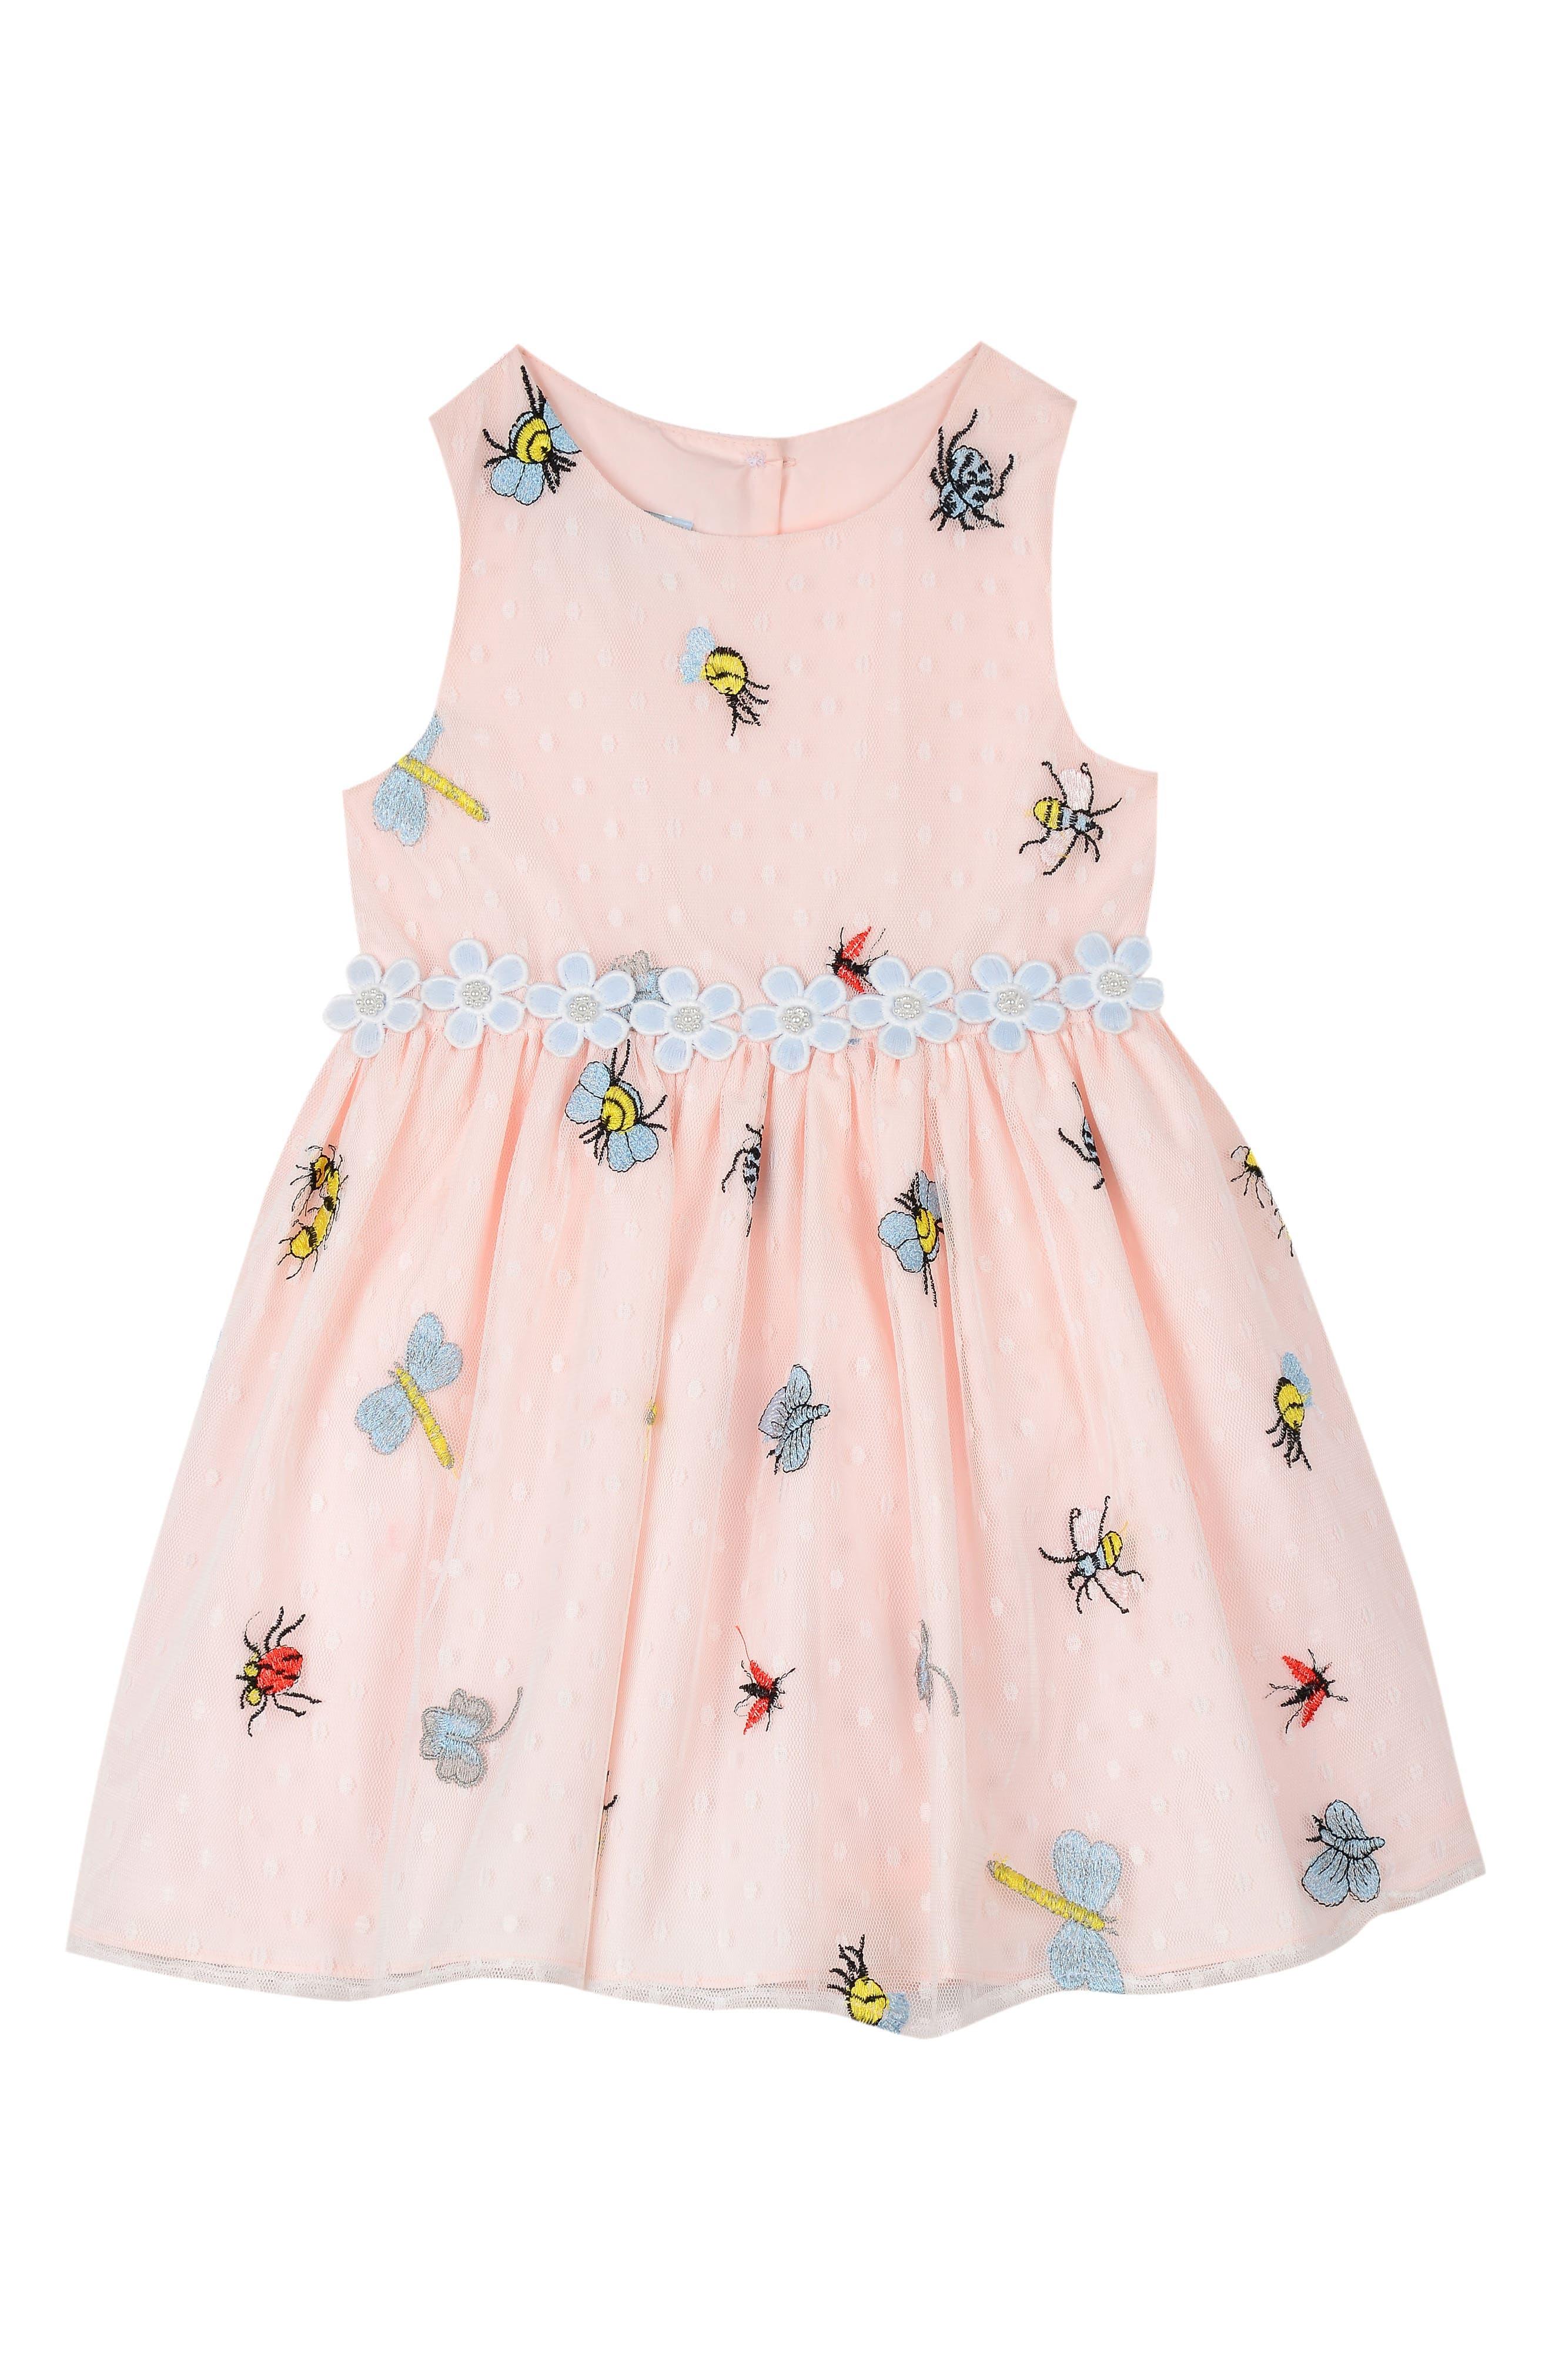 Pippa & Julie Embroidered Mesh Fit & Flare Dress (Toddler Girls, Little Girls & Big Girls)